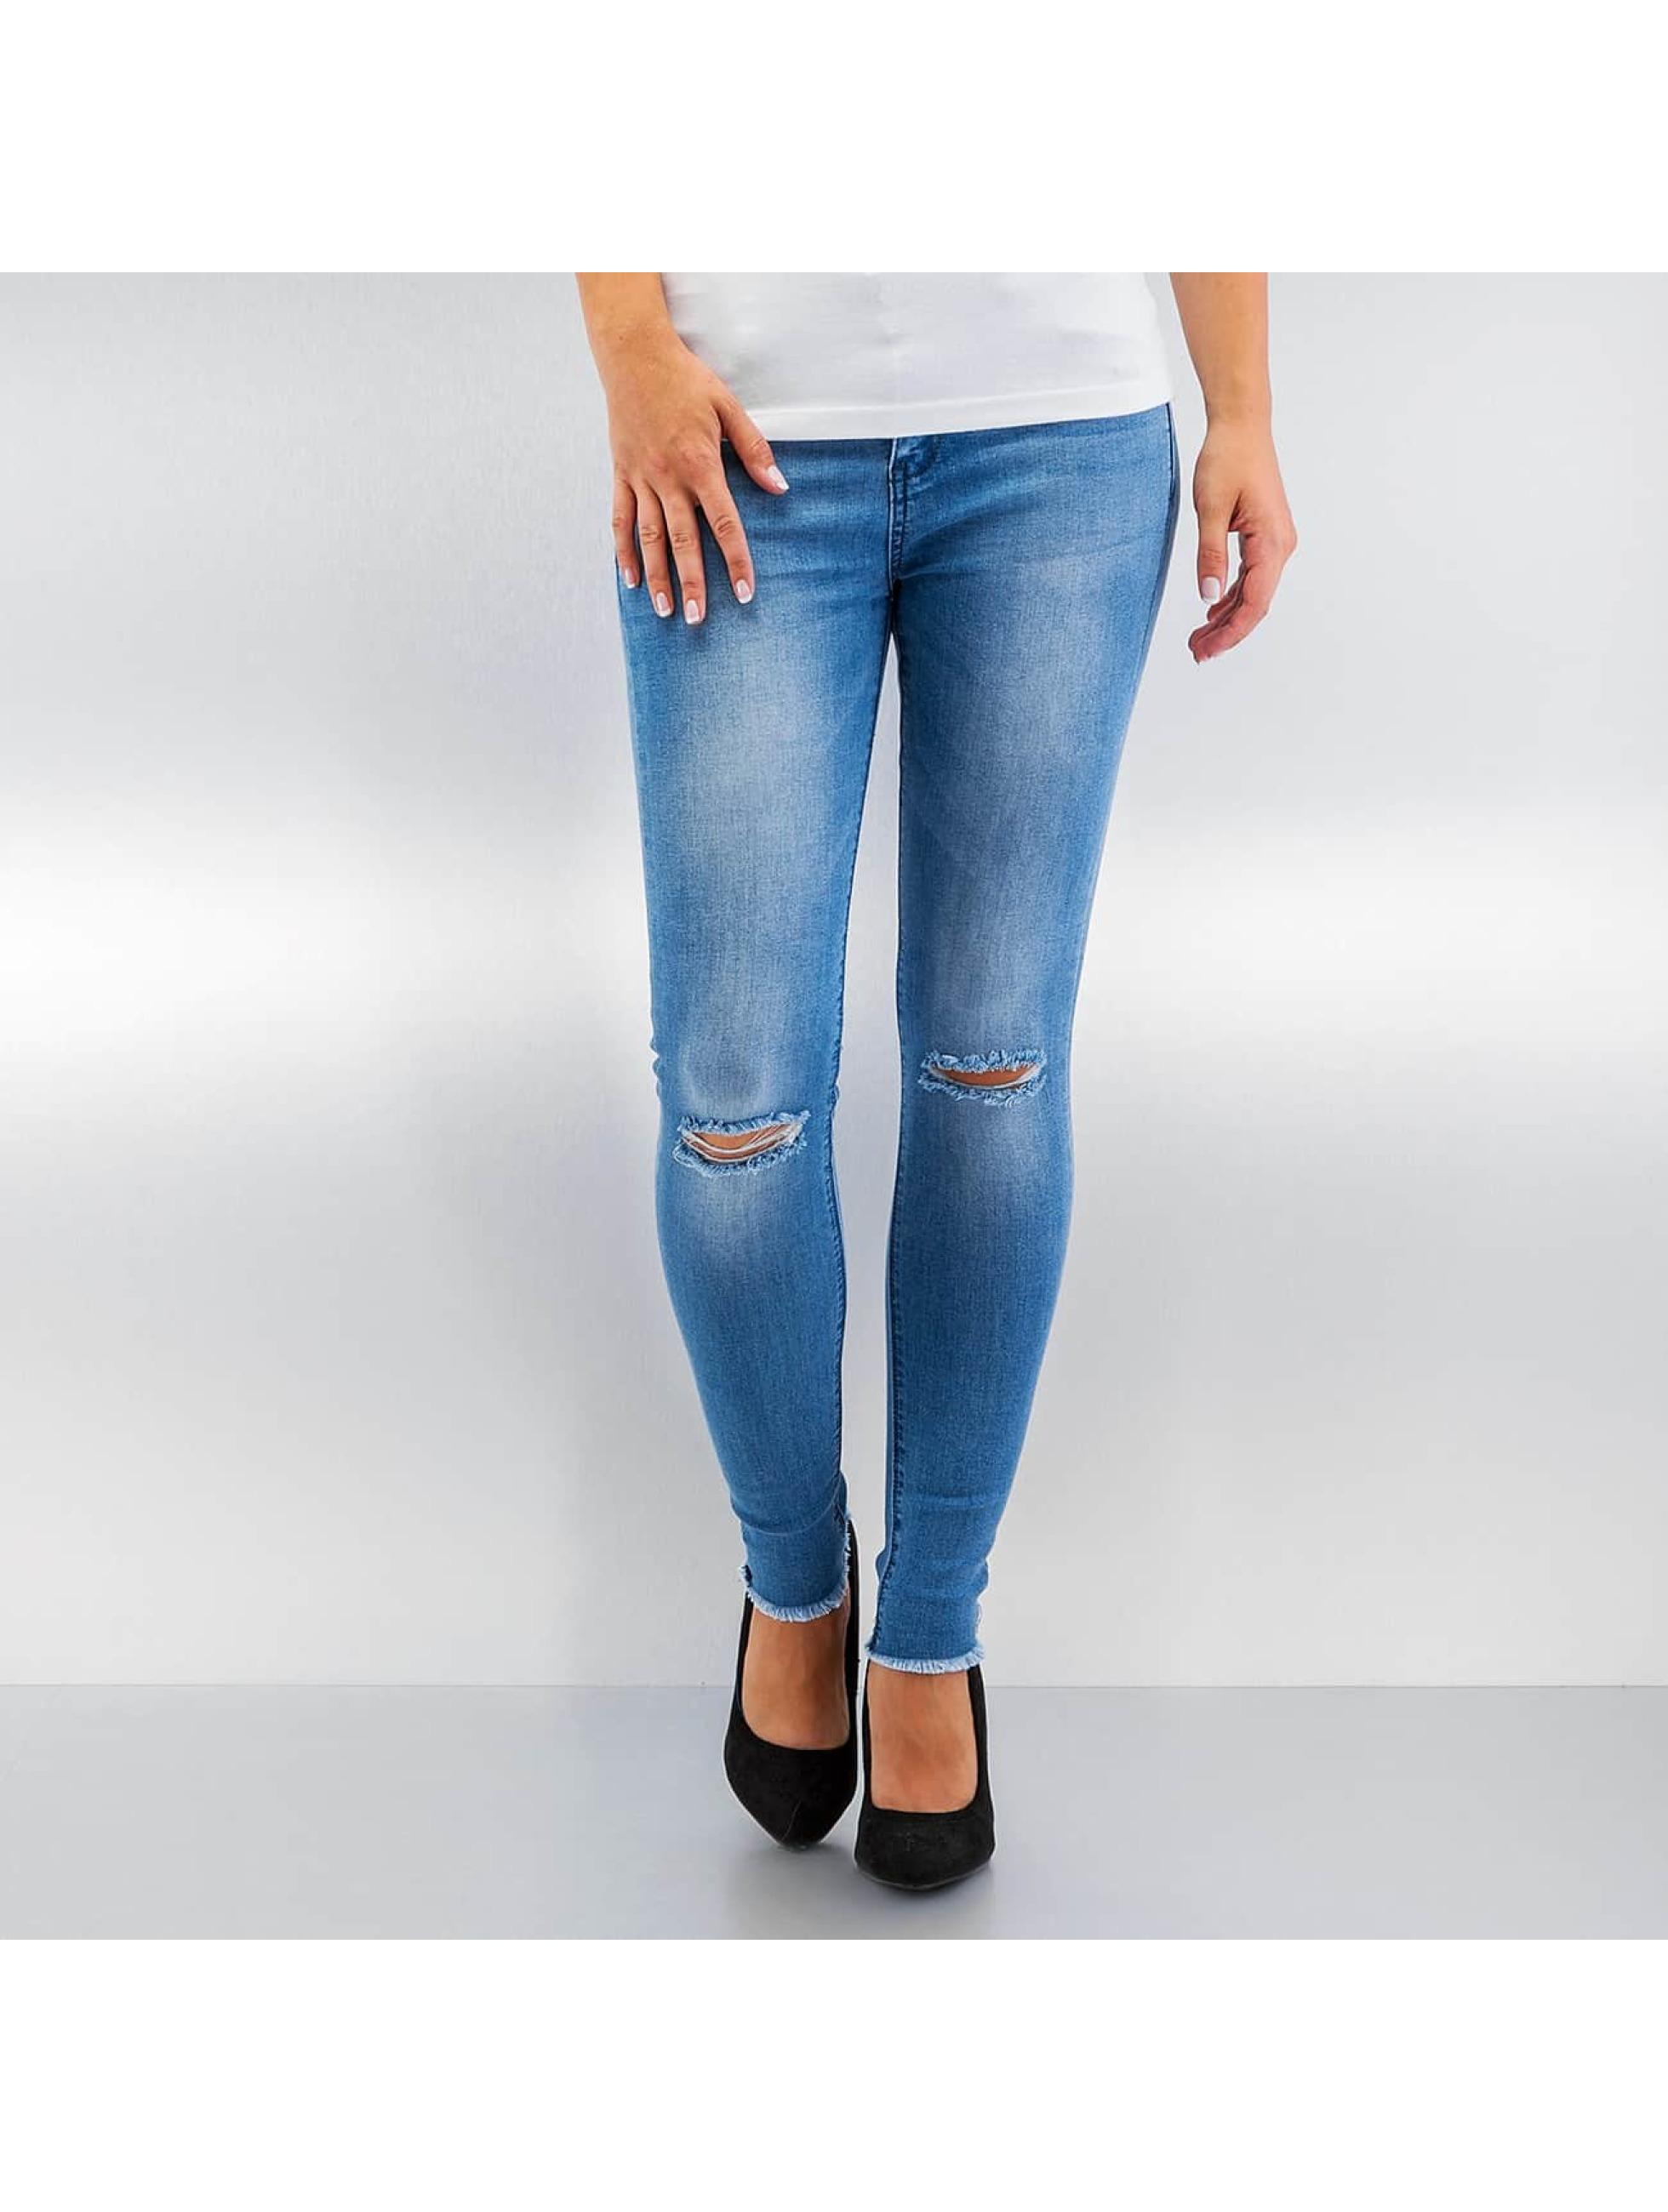 Hailys Ina bleu Jean skinny femme